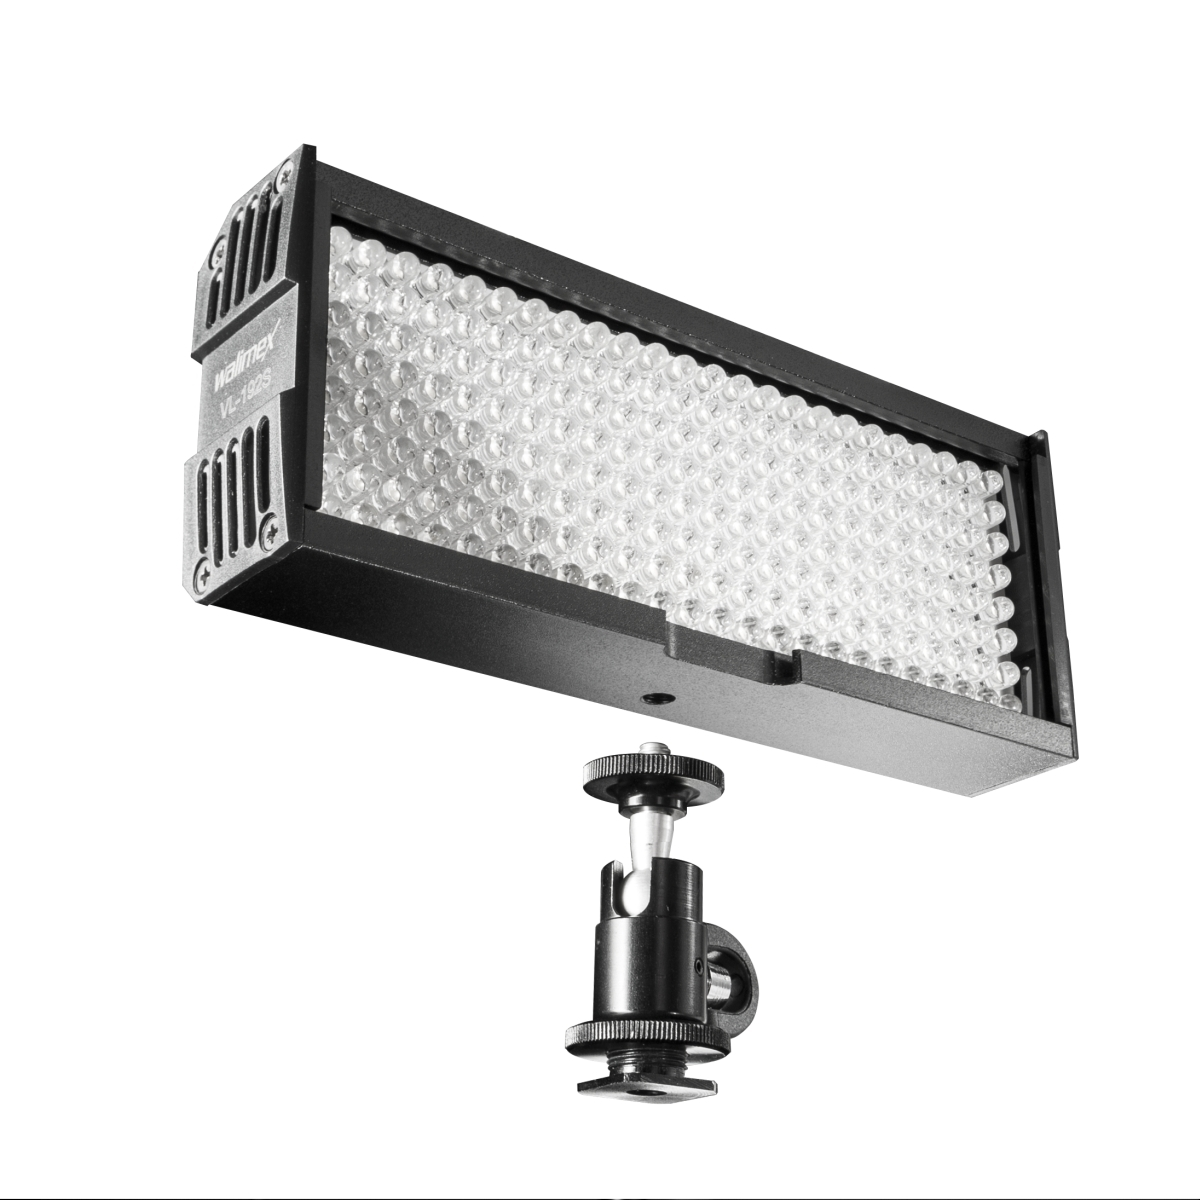 Walimex pro LED Video Light 192 Daylight